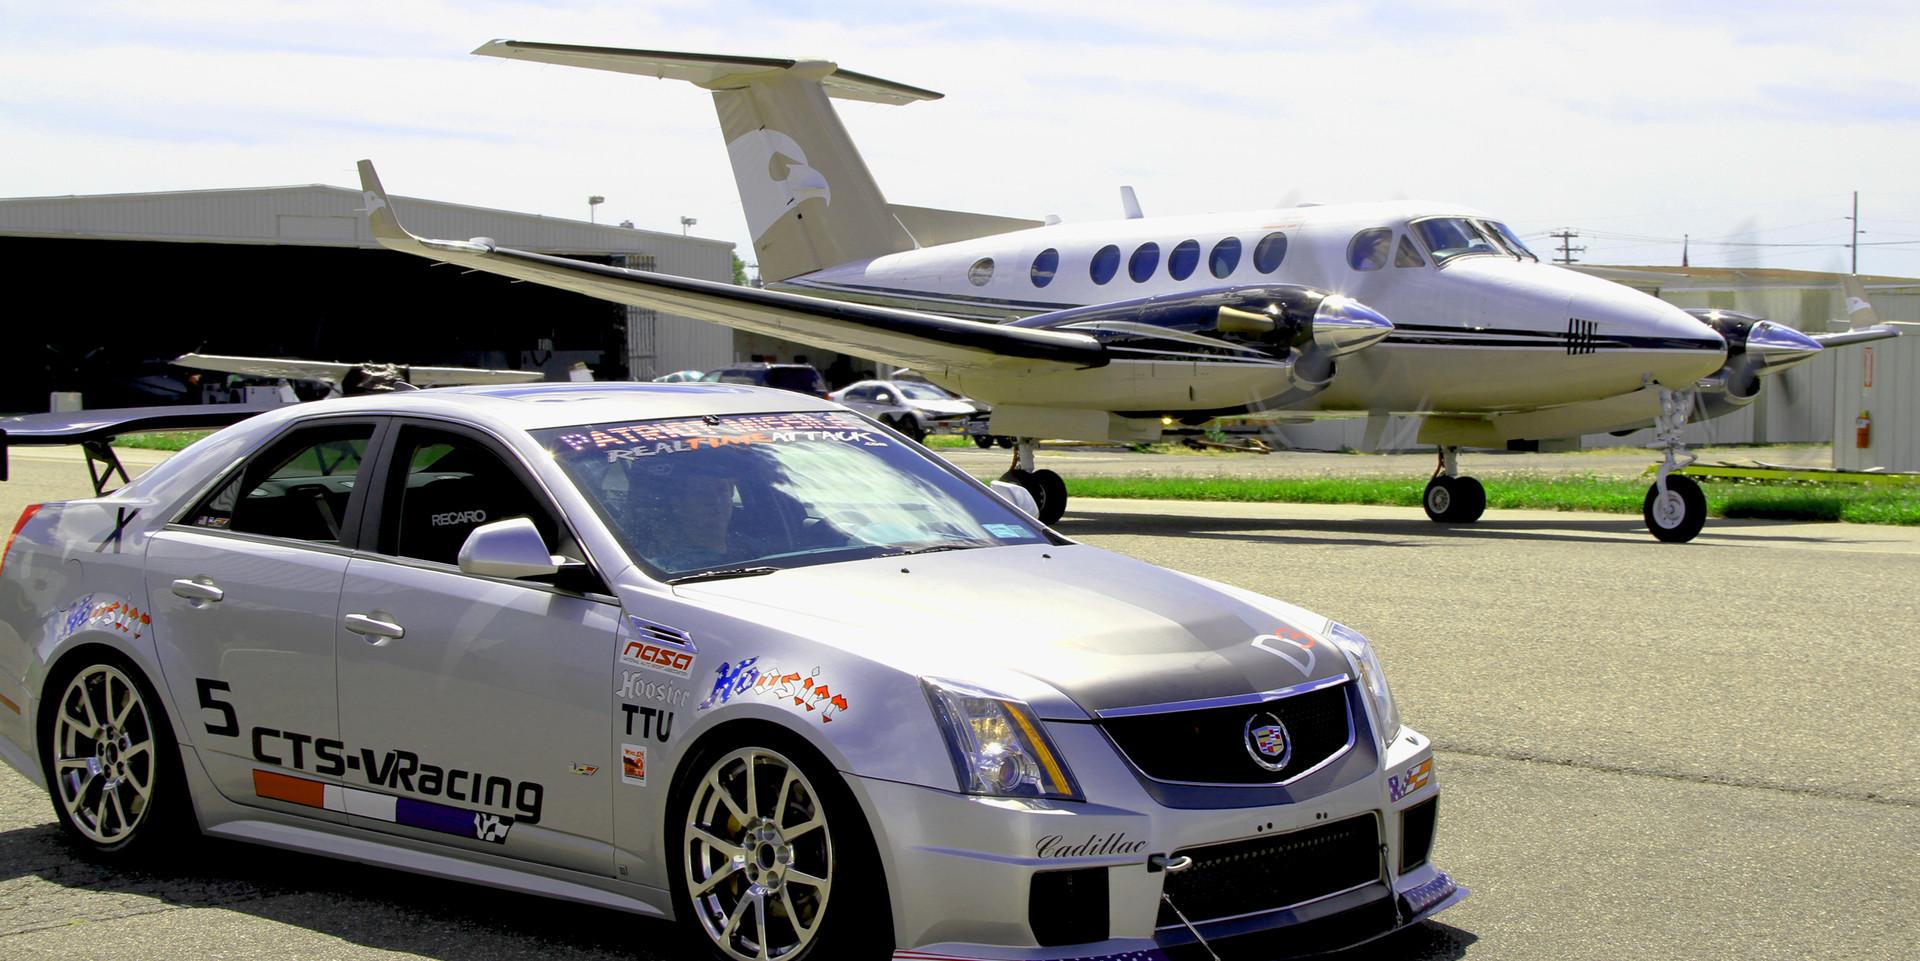 CTS-V Racing photoshoot at Republic Airport (8-15-2013)